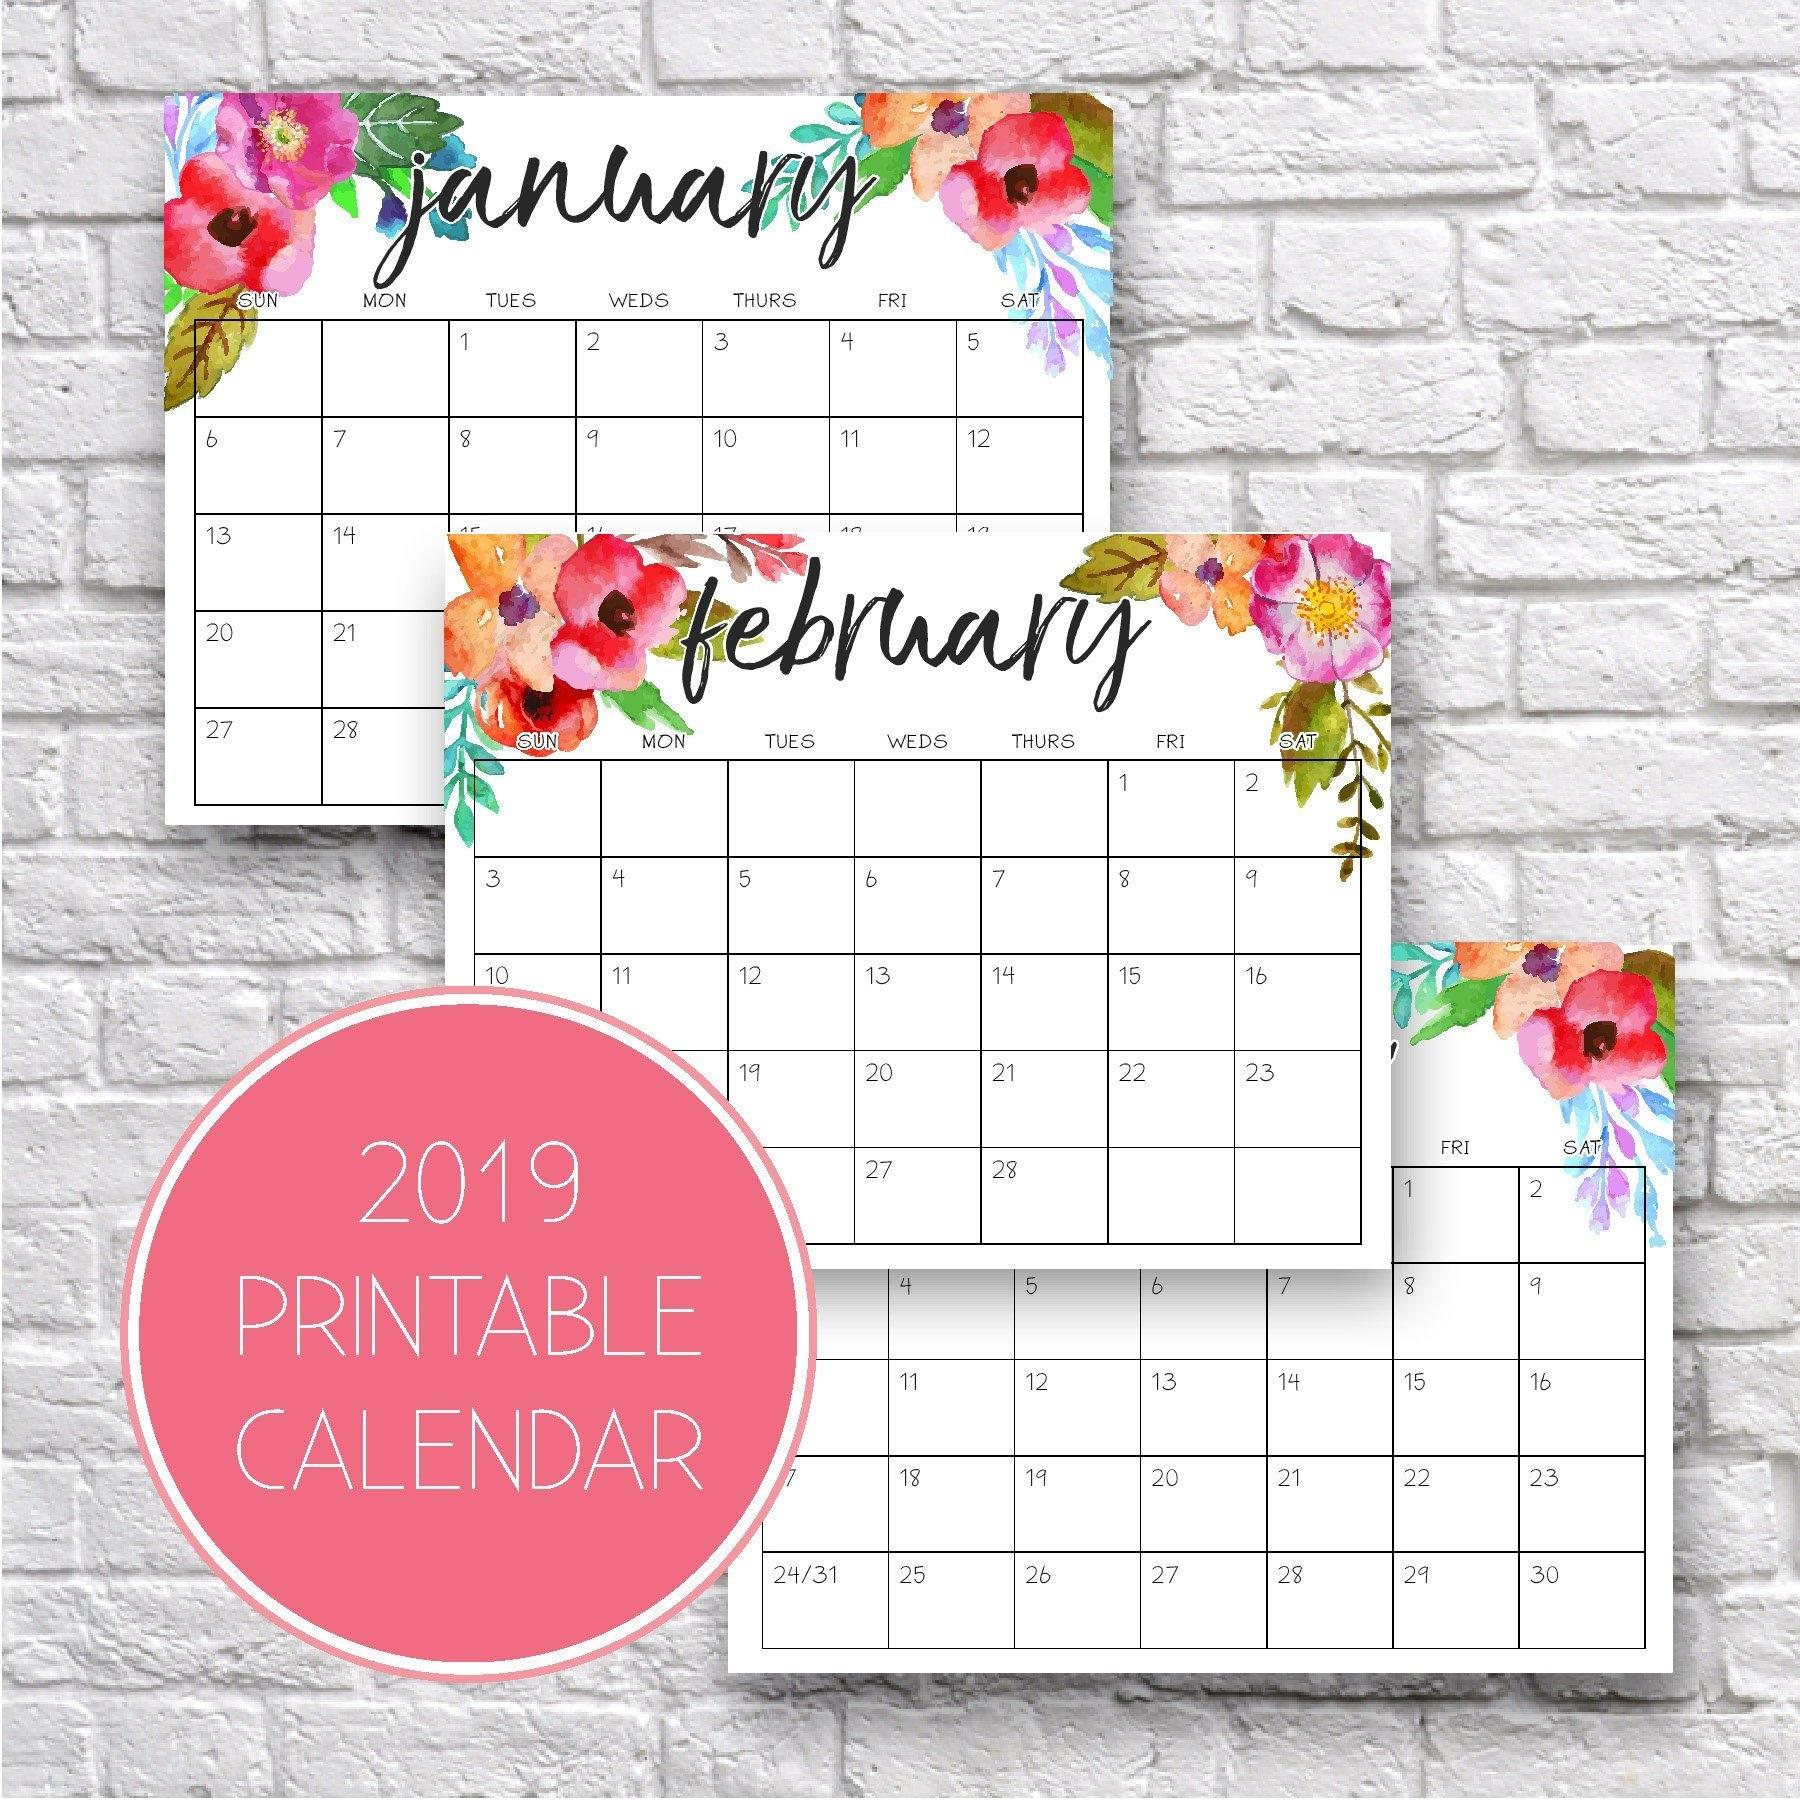 2019 Calendar 2019 Monthly Calendar Monthly Organizer 2019   Etsy C&k Calendar 2019